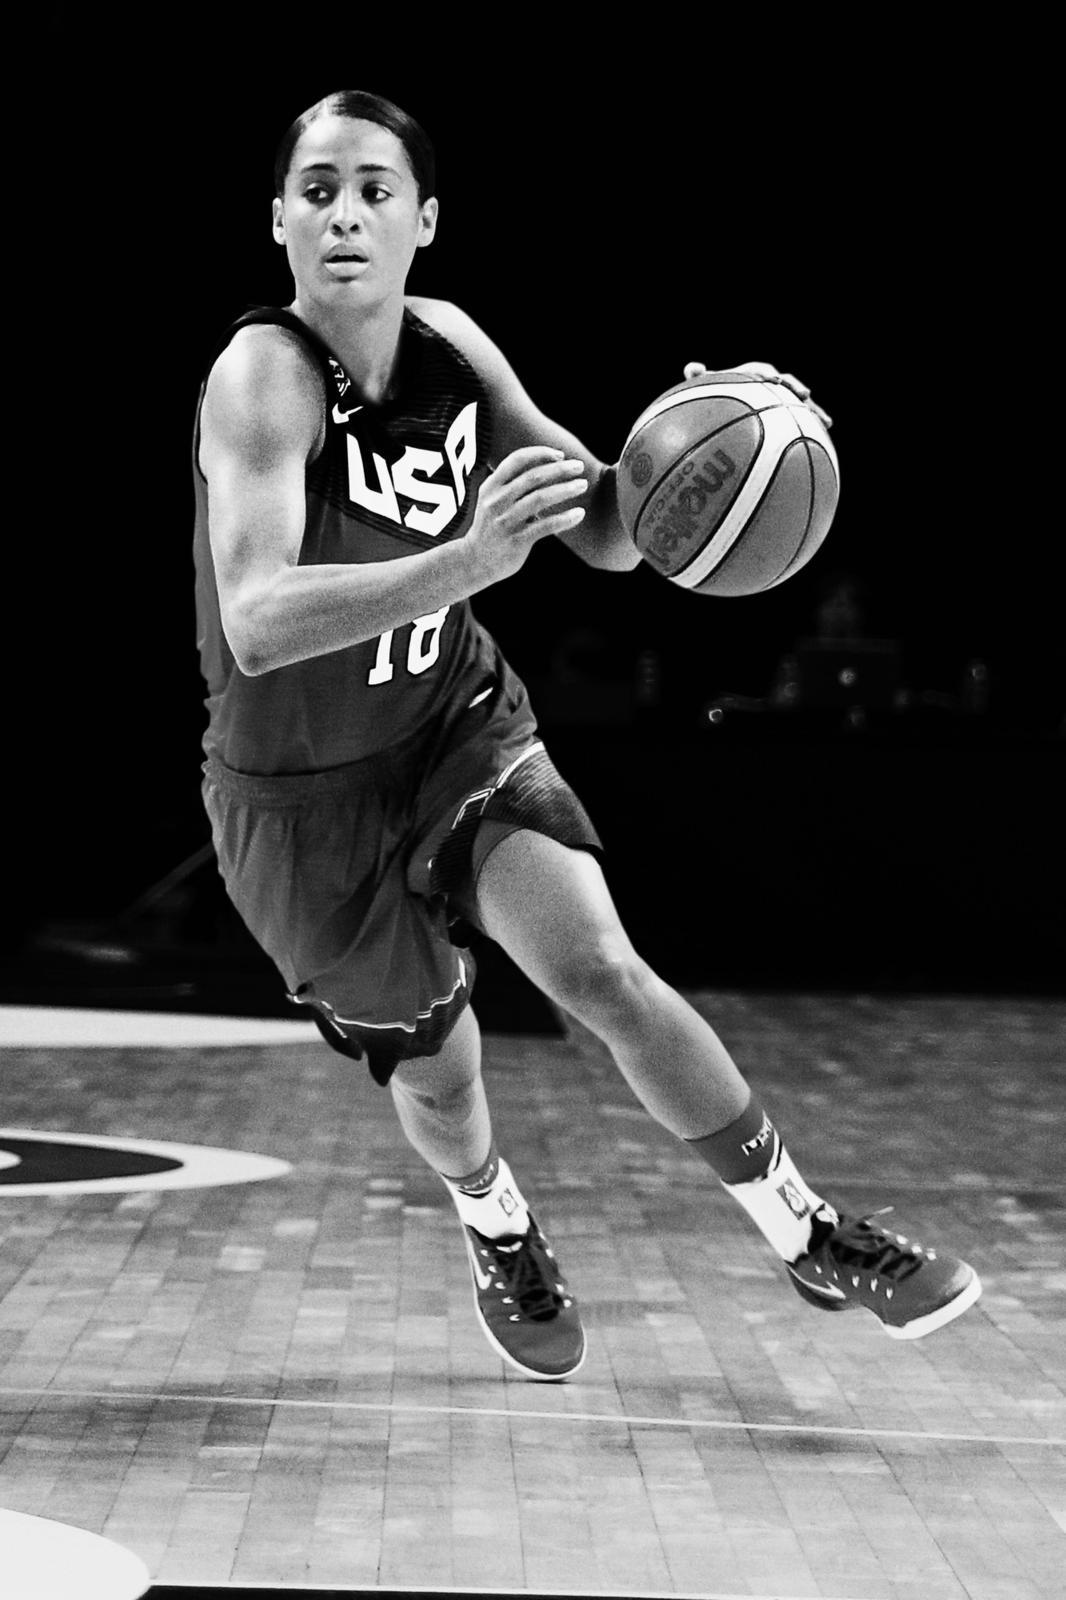 Nike_Skylar Diggins_On Court